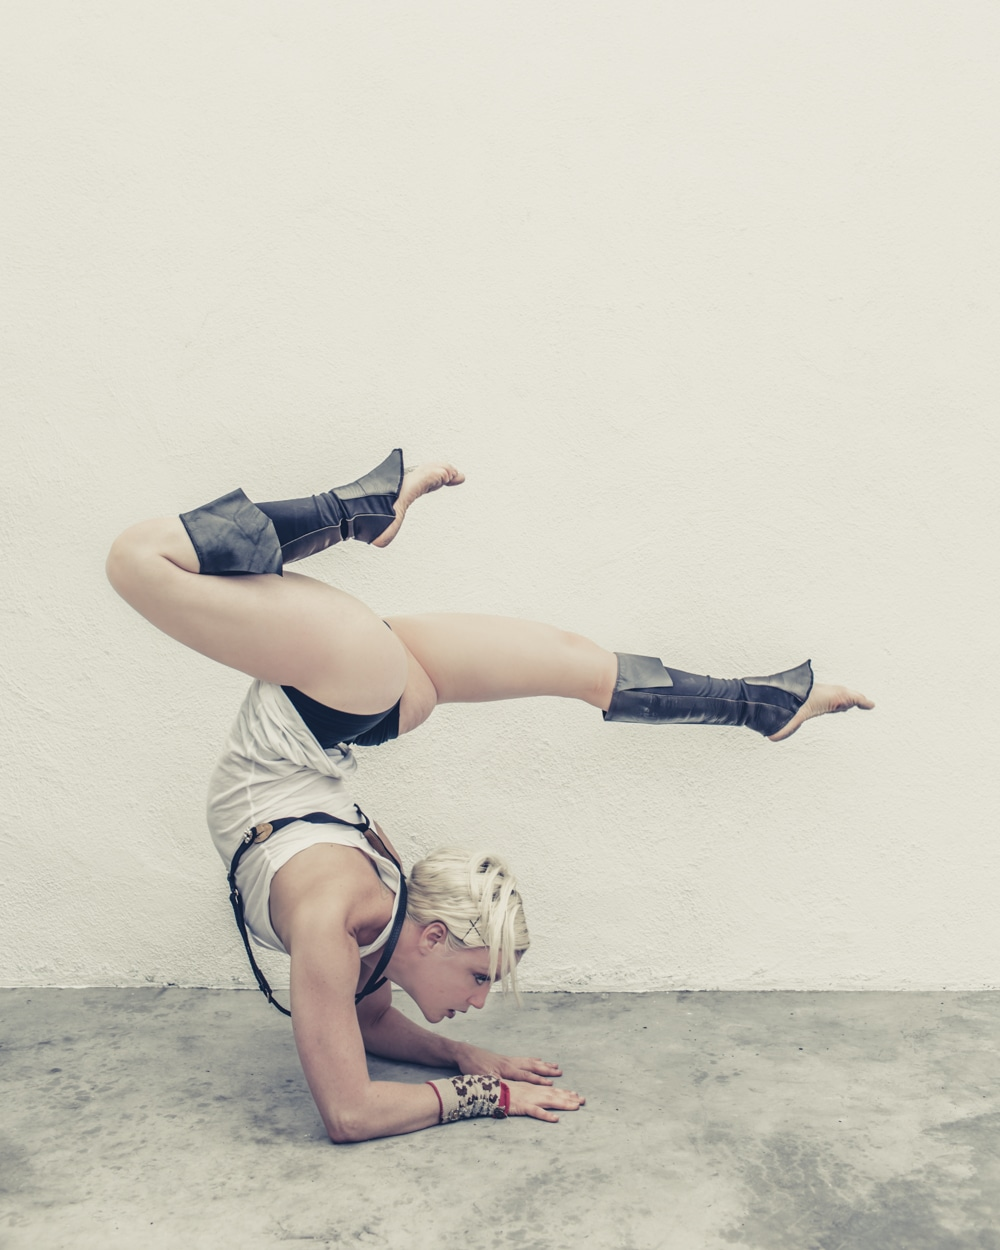 pole_dance_contorts_fashion_gregory_beylerian_1